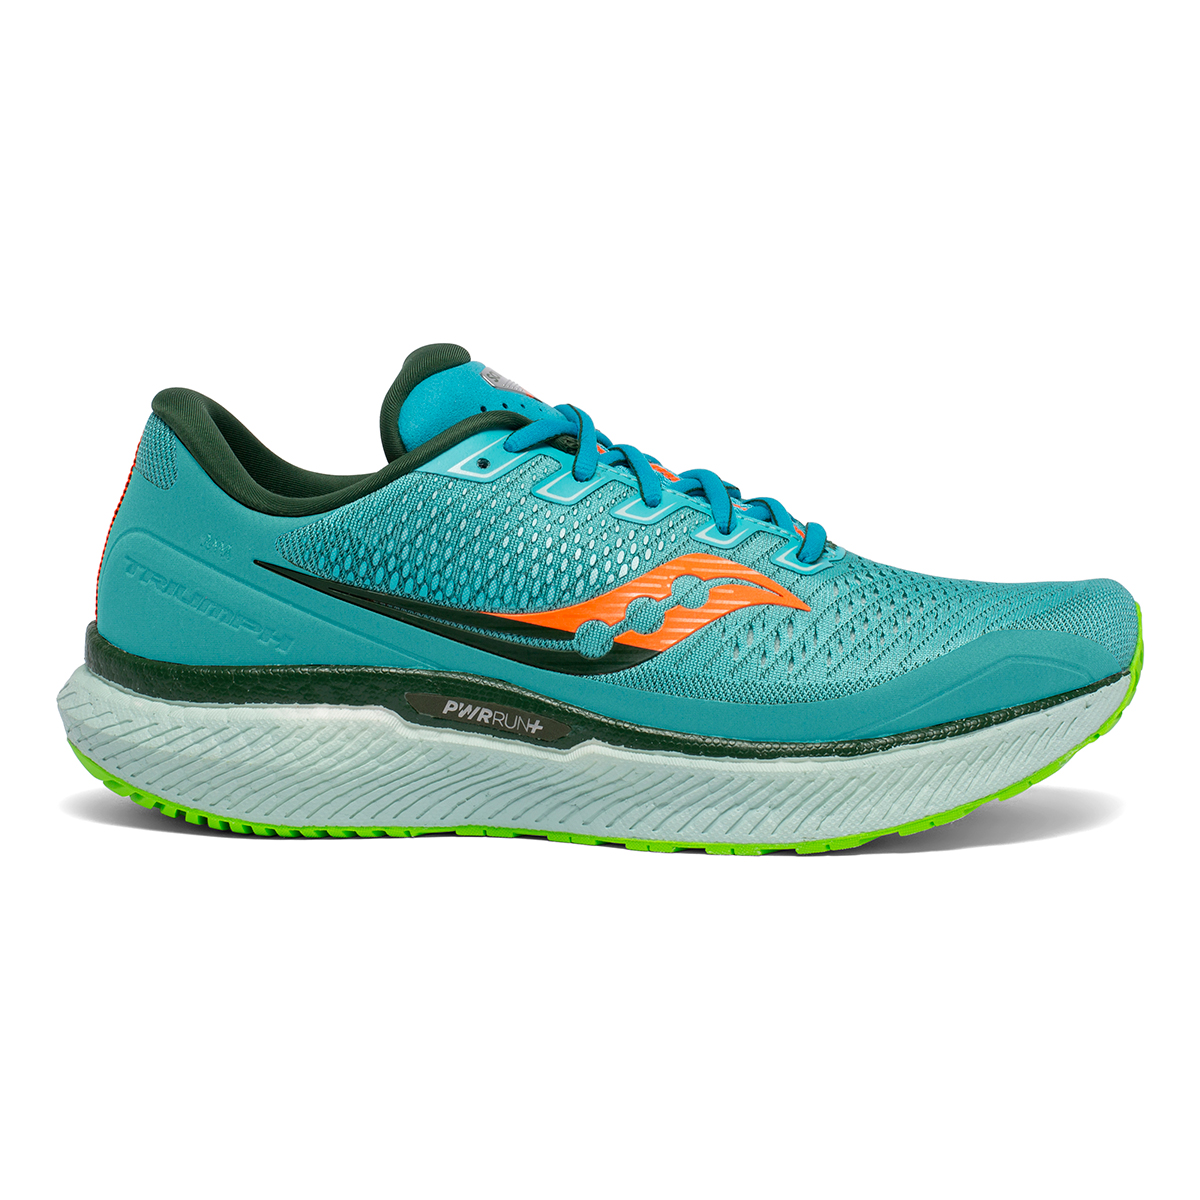 Men's Saucony Triumph 18 Running Shoe - Color: Future/Blue - Size: 7 - Width: Regular, Future/Blue, large, image 1